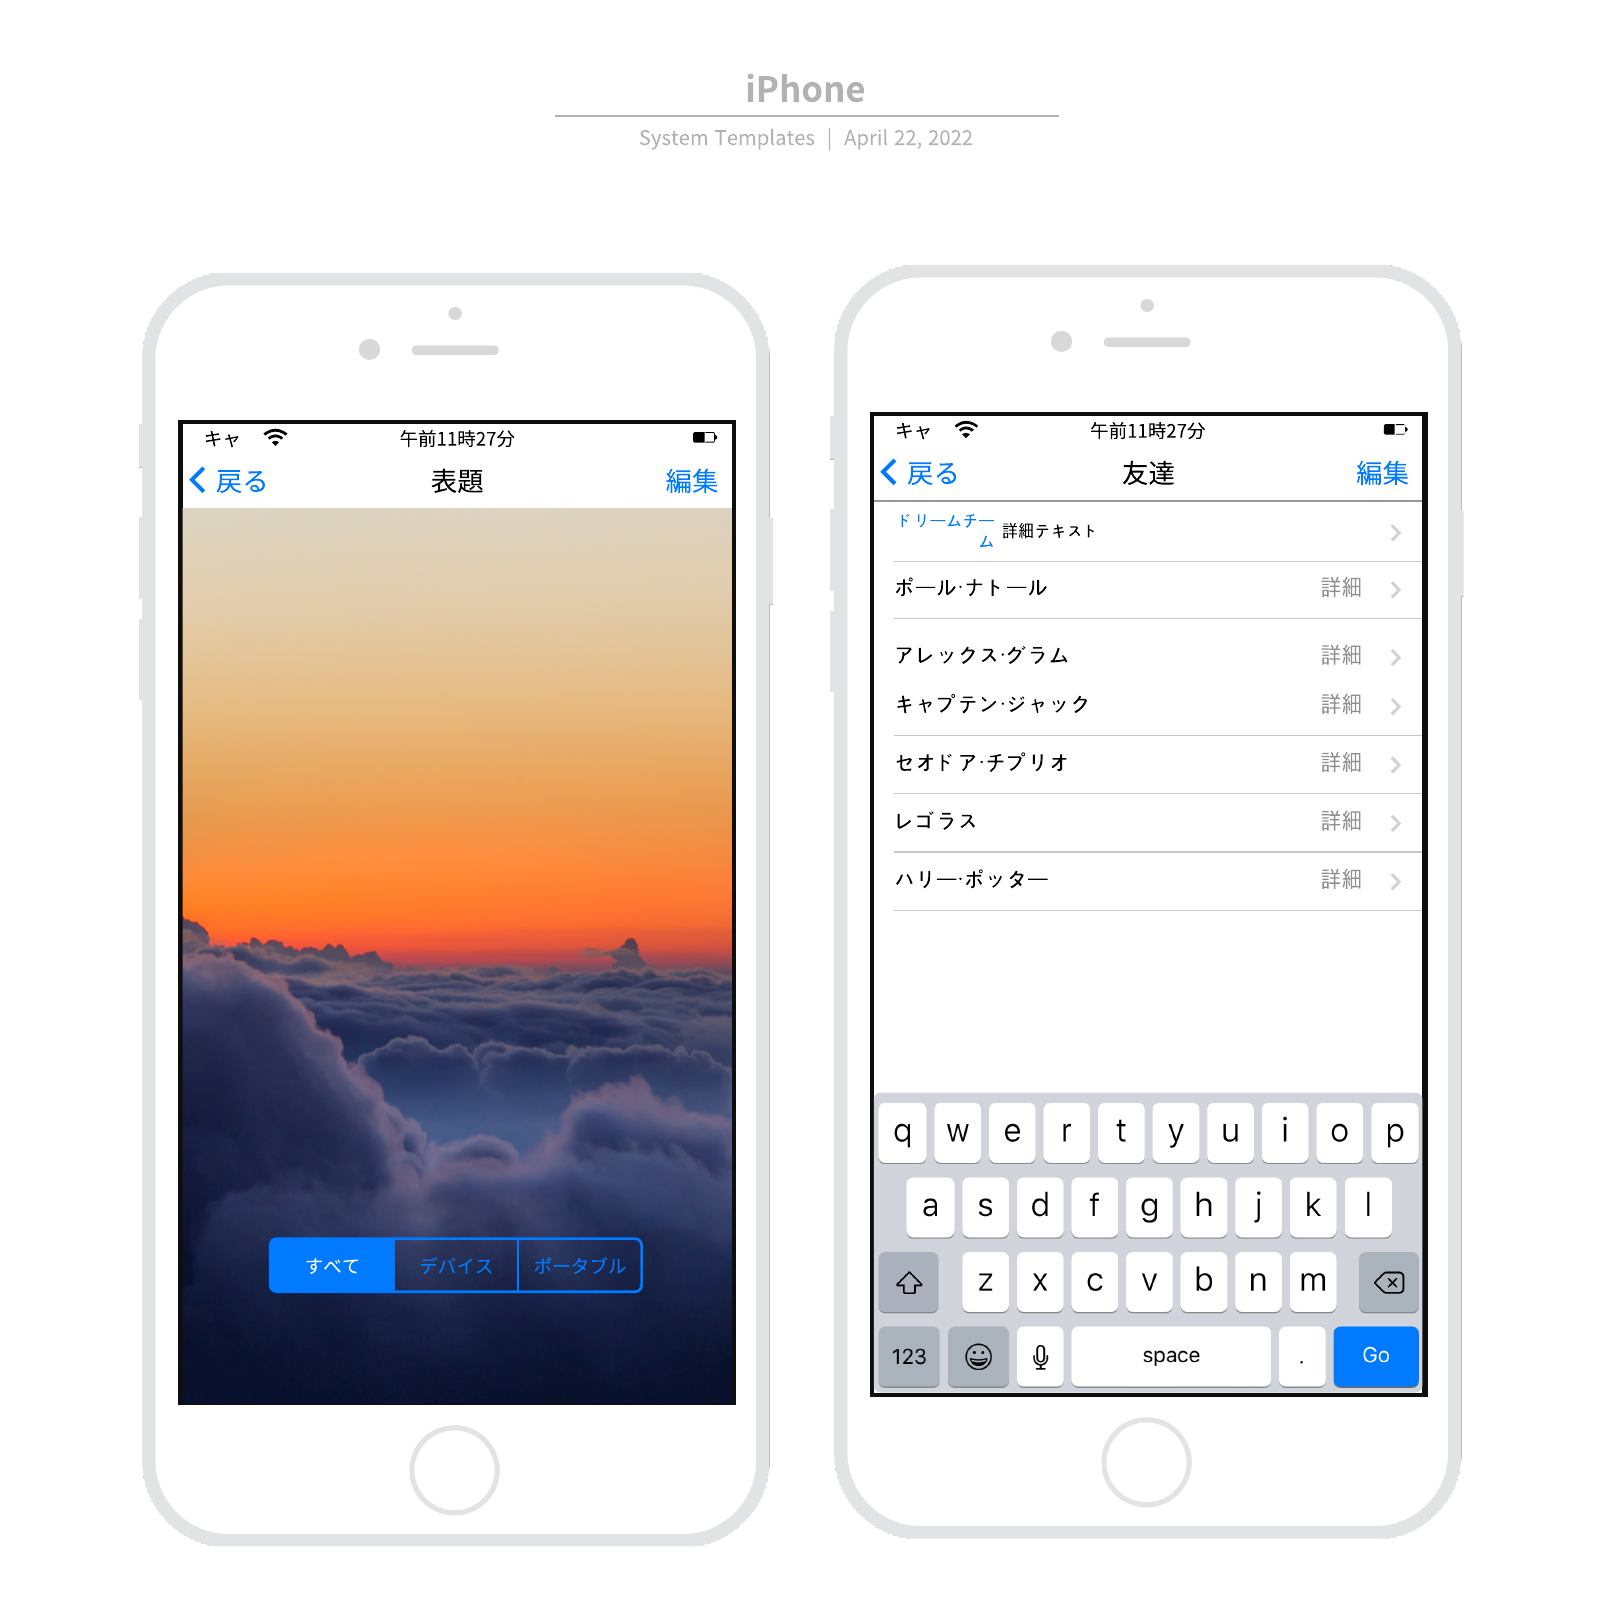 iPhone 無料モックアップ素材テンプレート